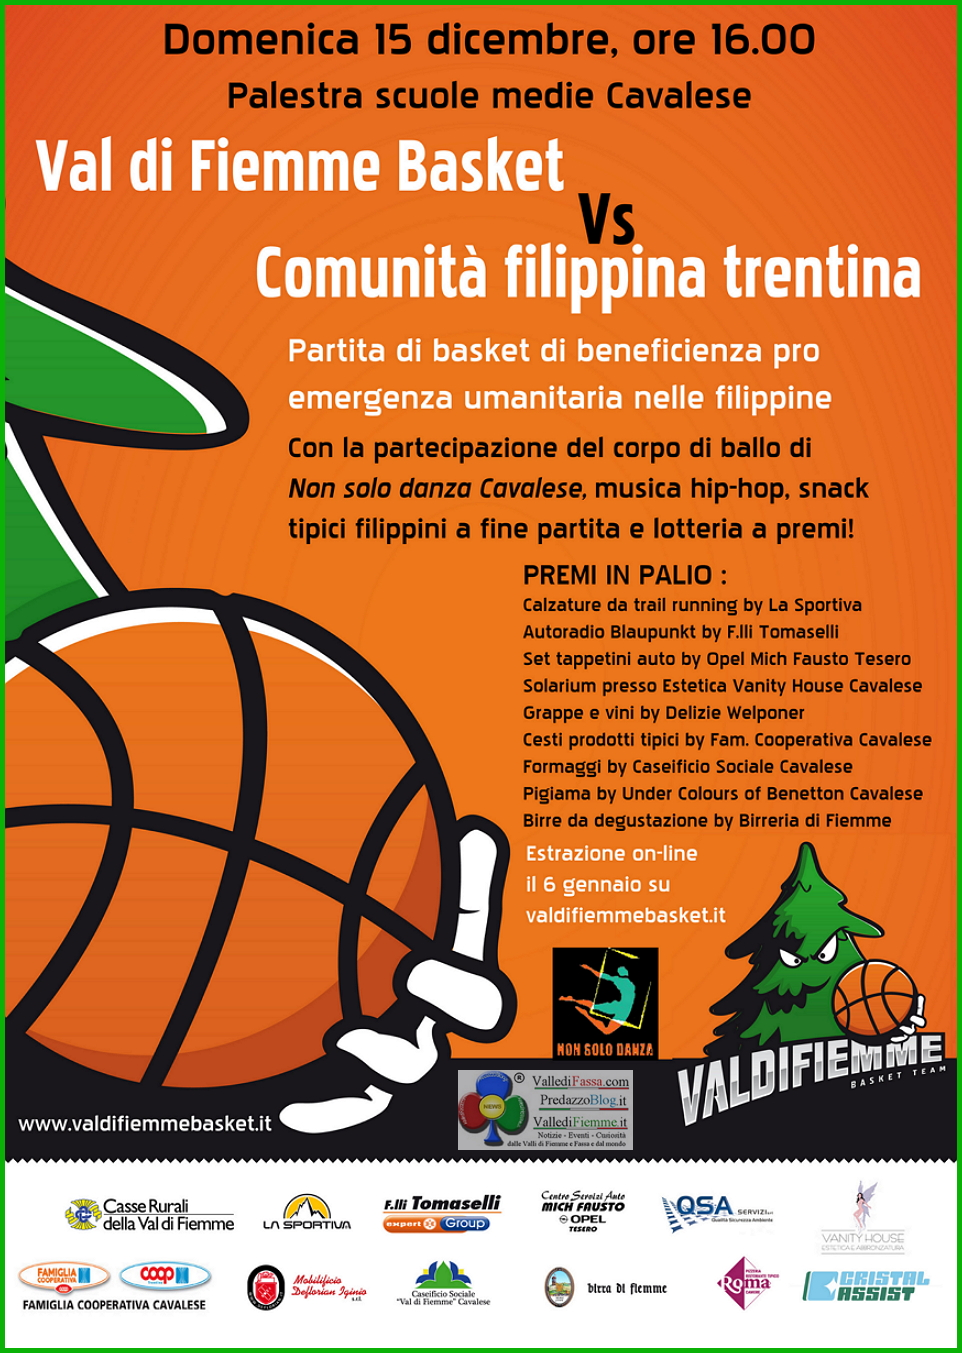 basket fiemme Cavalese, partita di beneficienza Basket Fiemme / Comunità Filippina Trentina